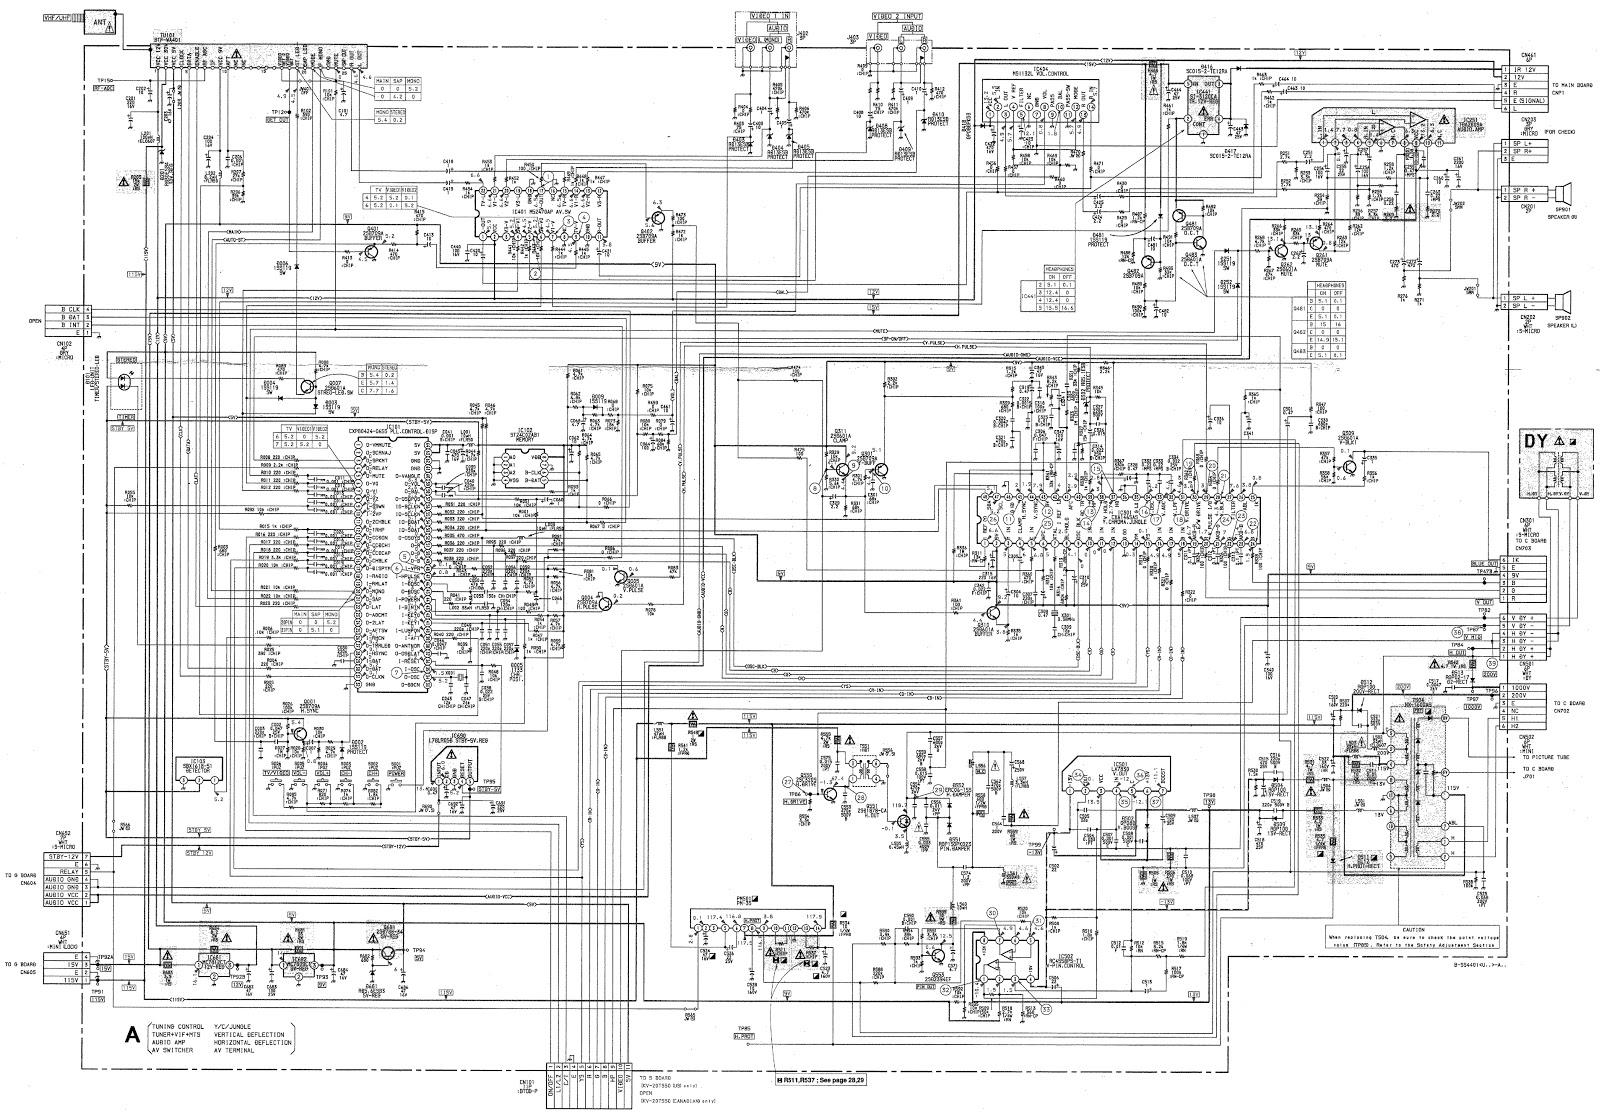 Sony KV20TS50  Trinitron TV Circuit Diagram (Schematic